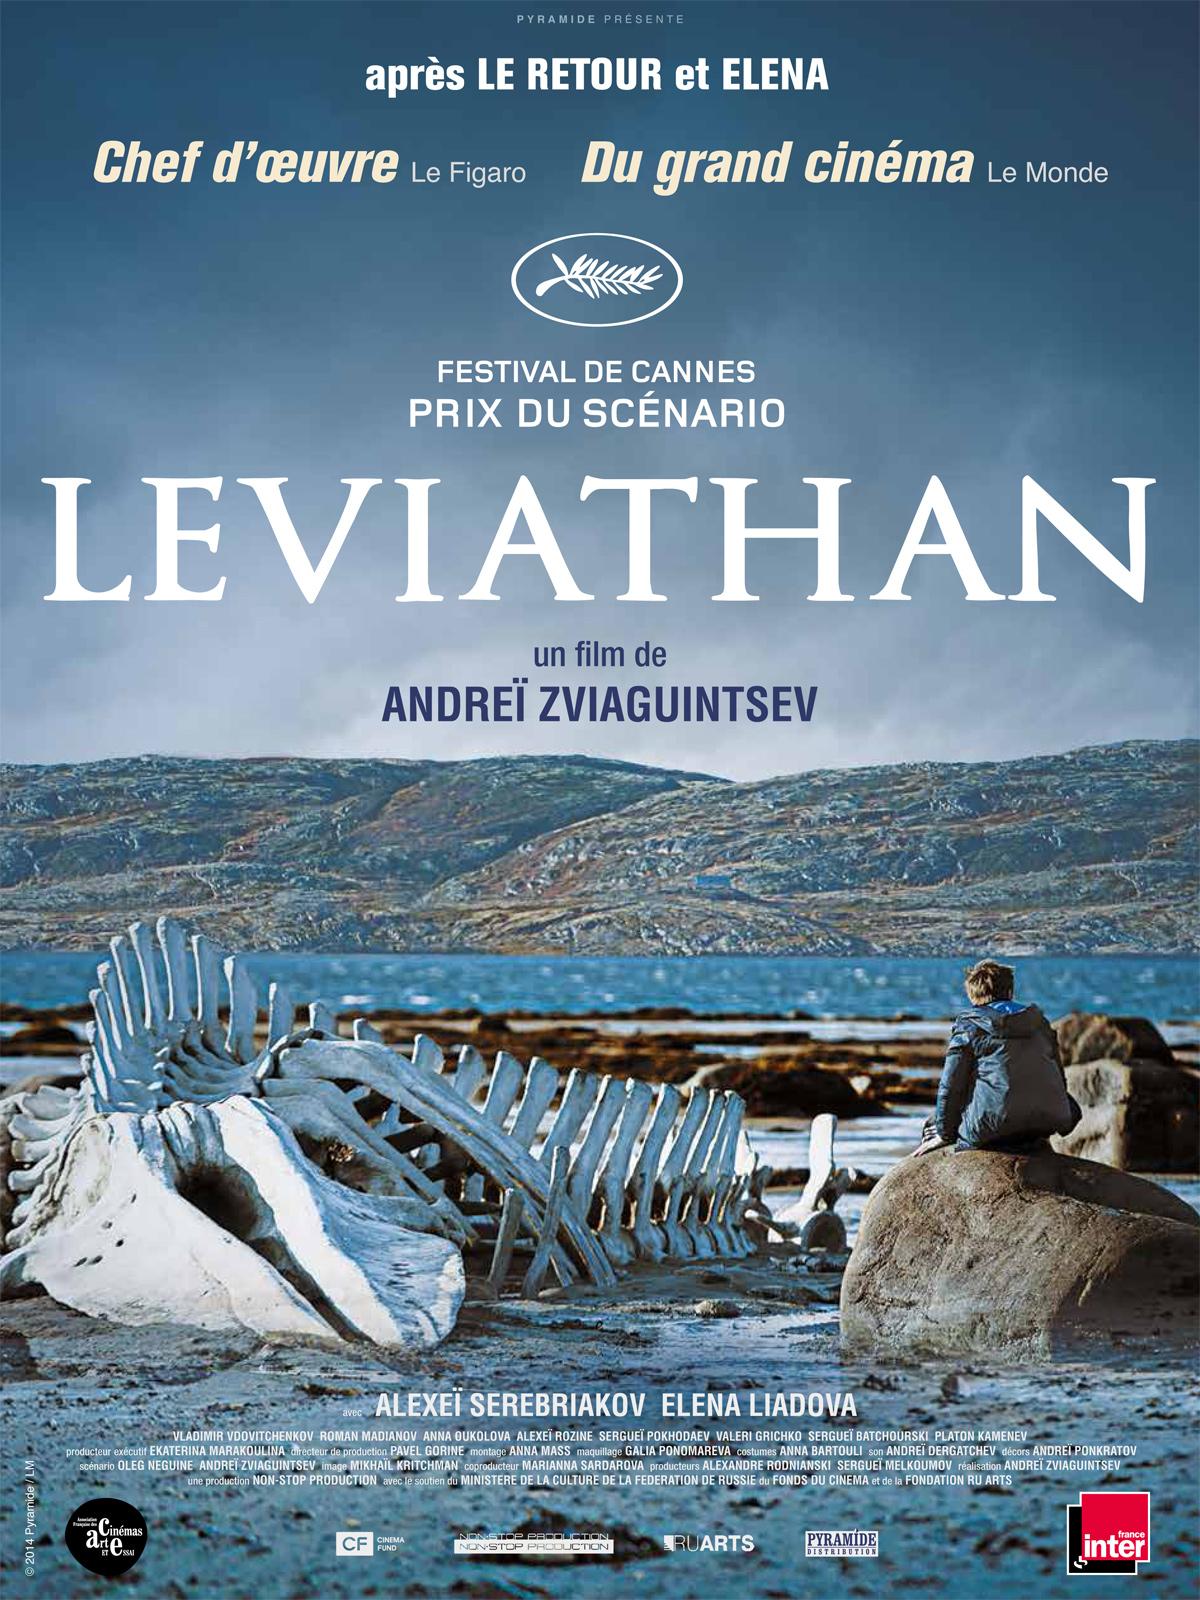 Leviathan de Andreï Zviaguintsev